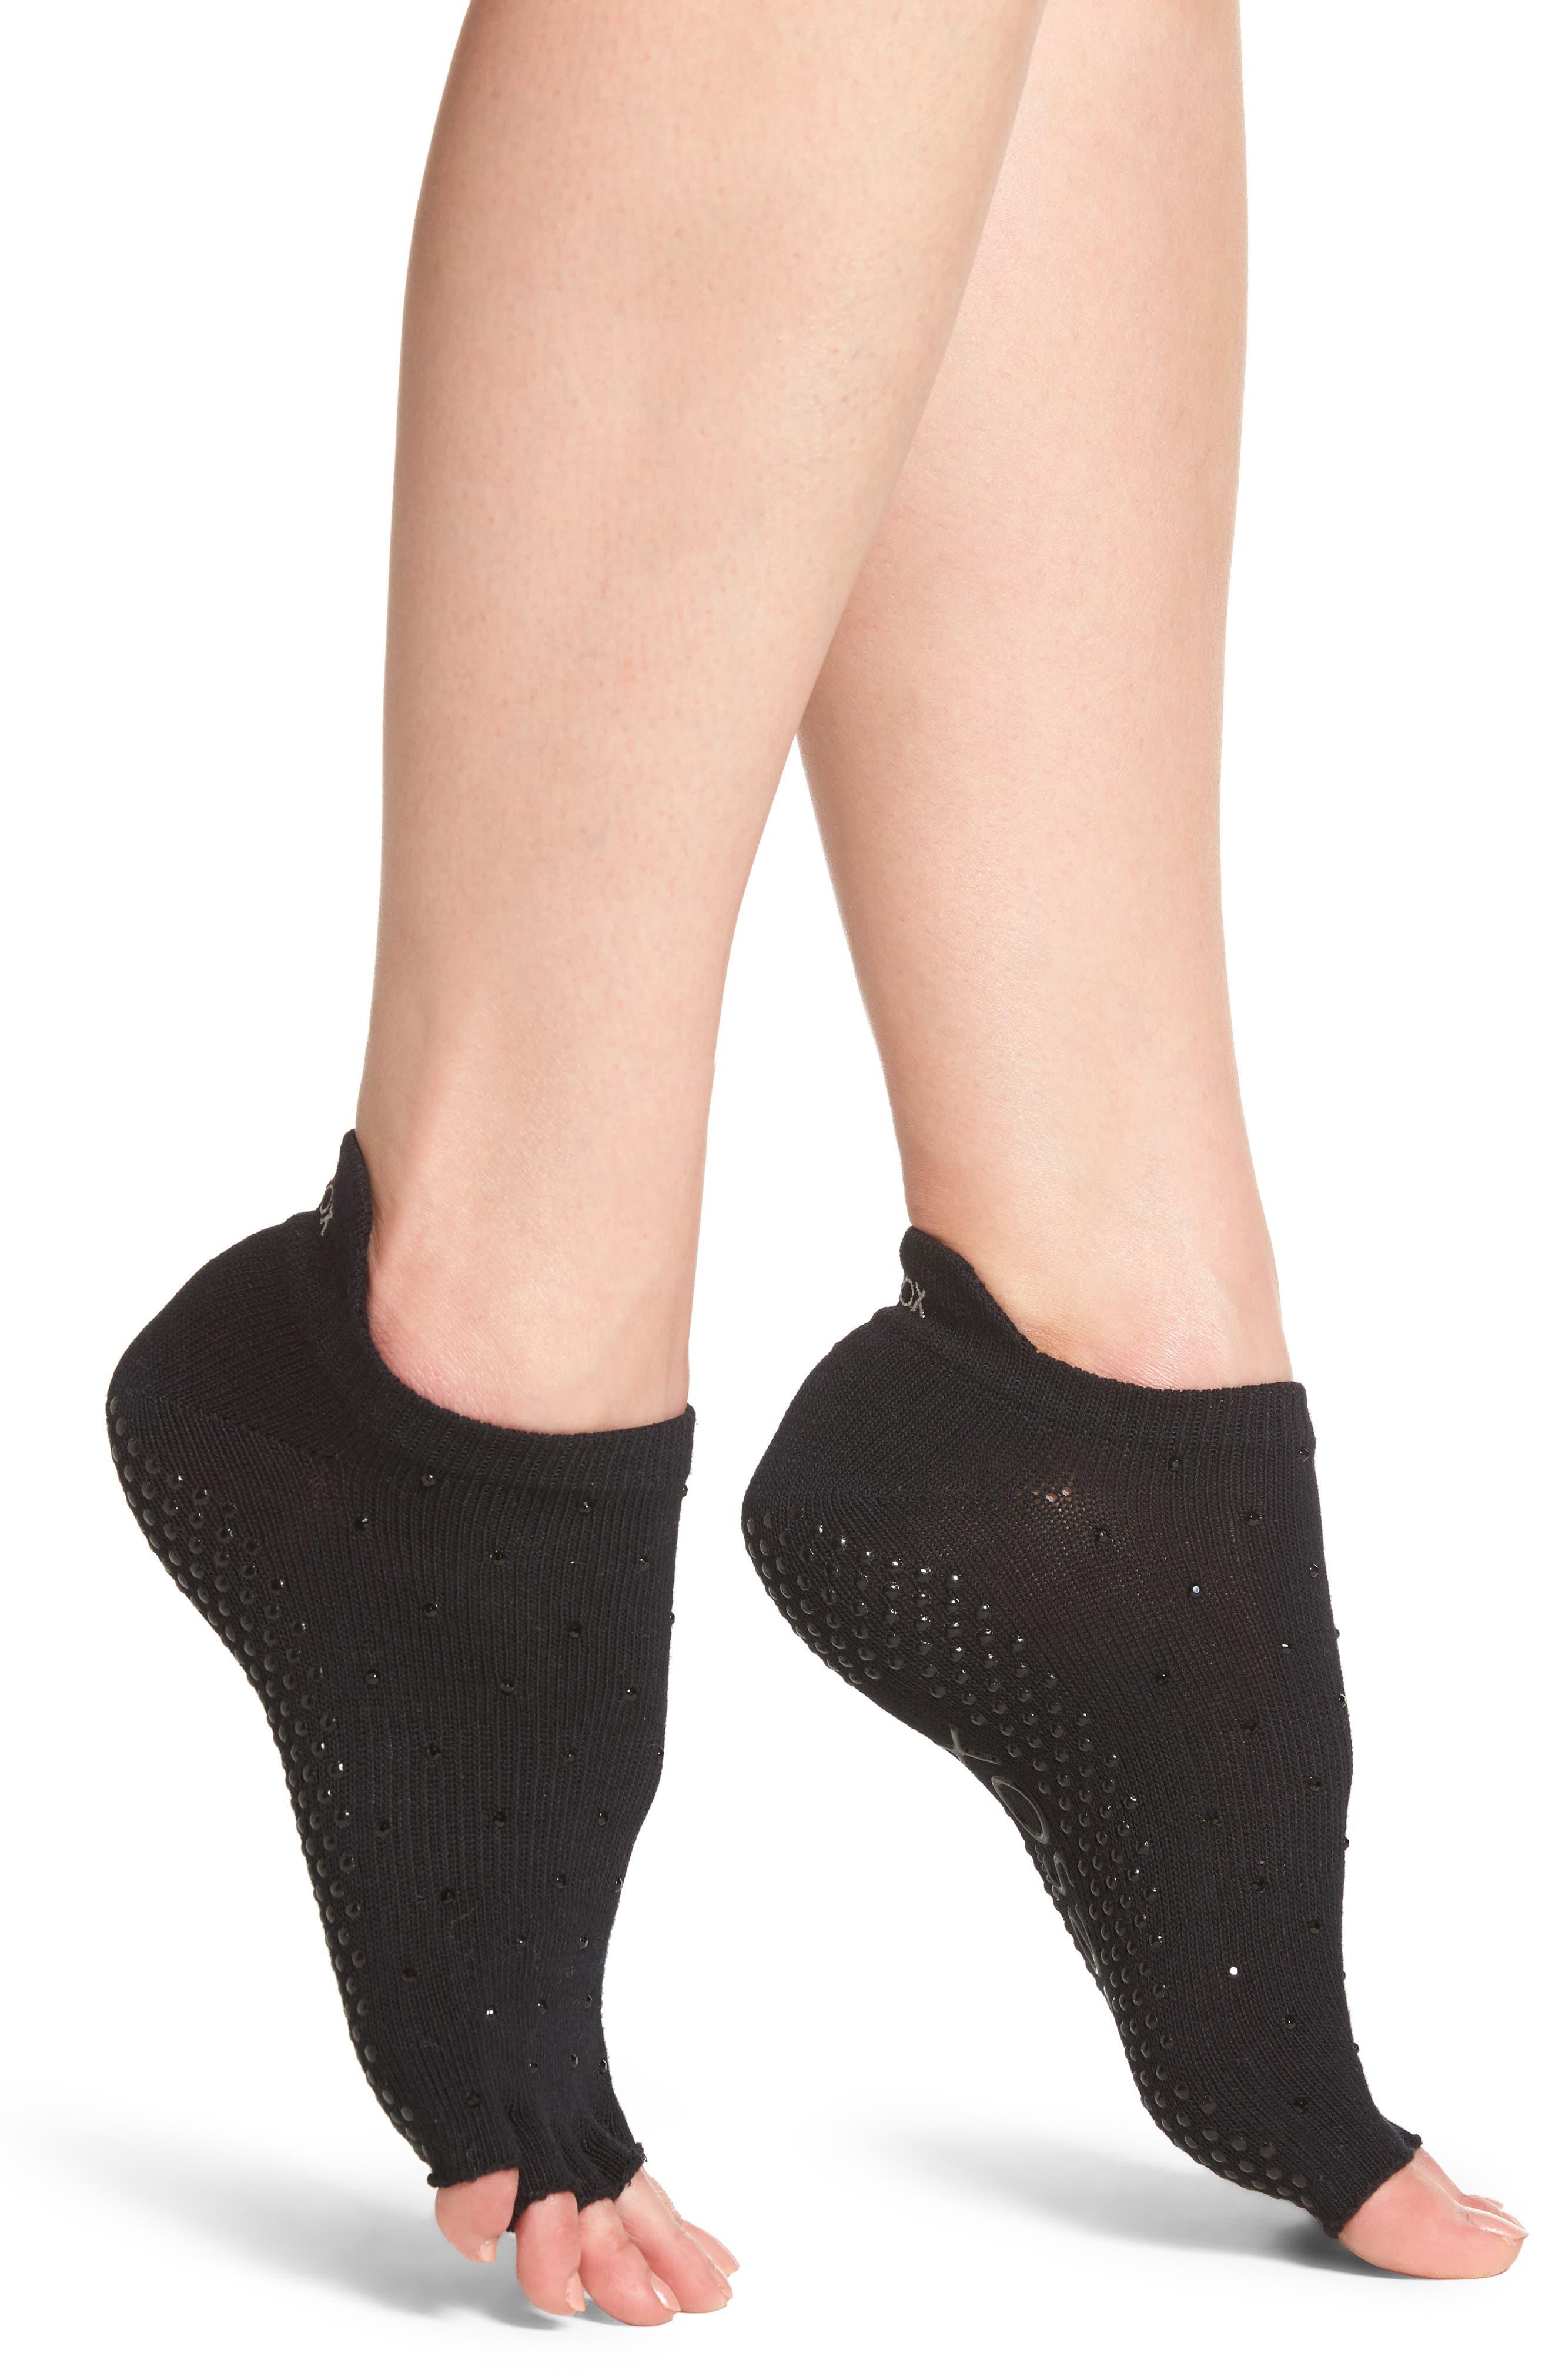 Main Image - ToeSox Half Toe Low Rise Grip Socks